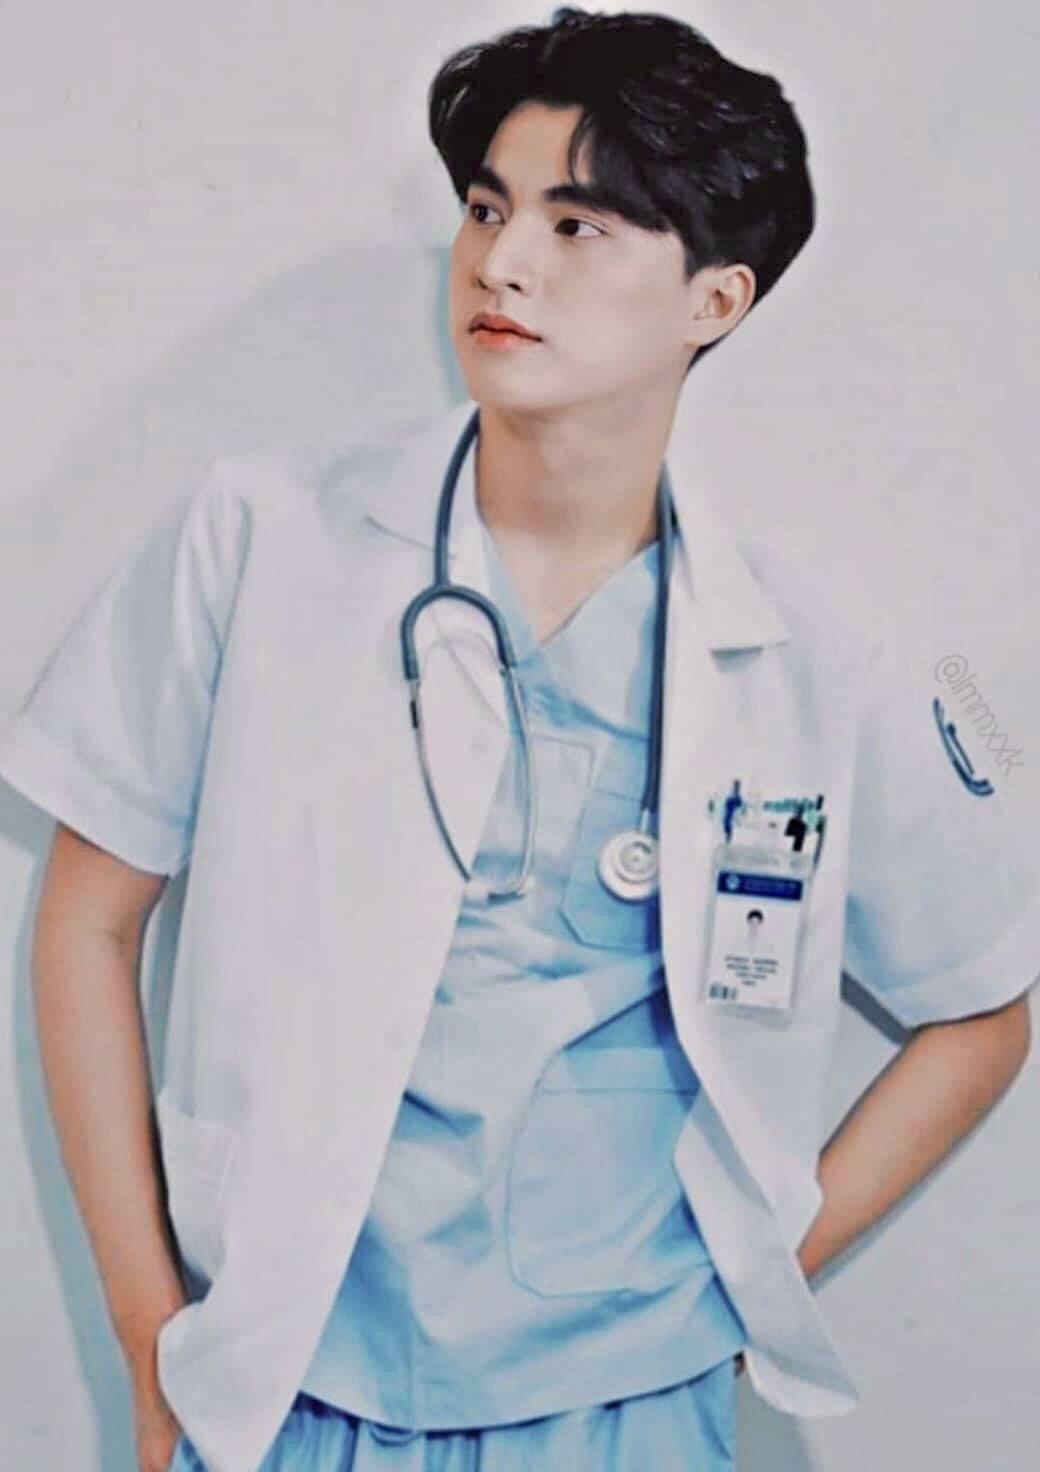 Baju Dokter